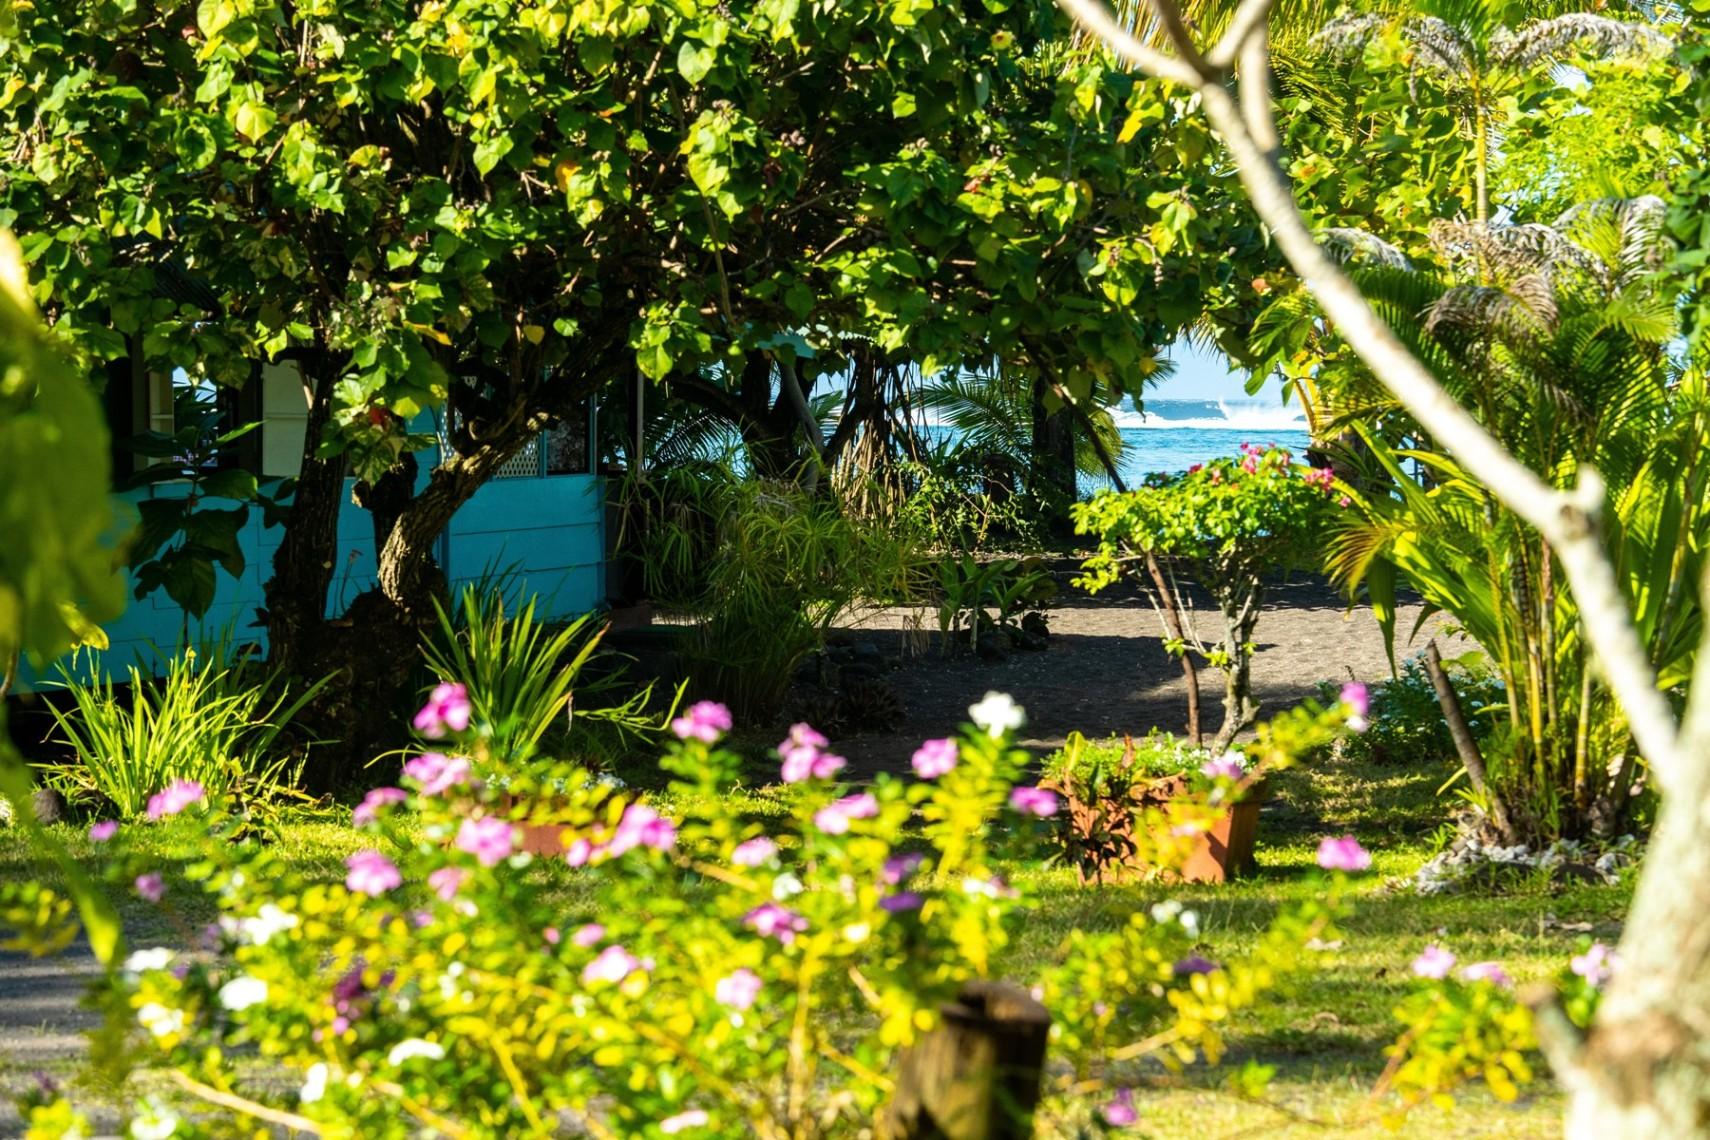 https://tahititourisme.kr/wp-content/uploads/2019/08/copie-tahiti-tourisme-800ko-1.jpg